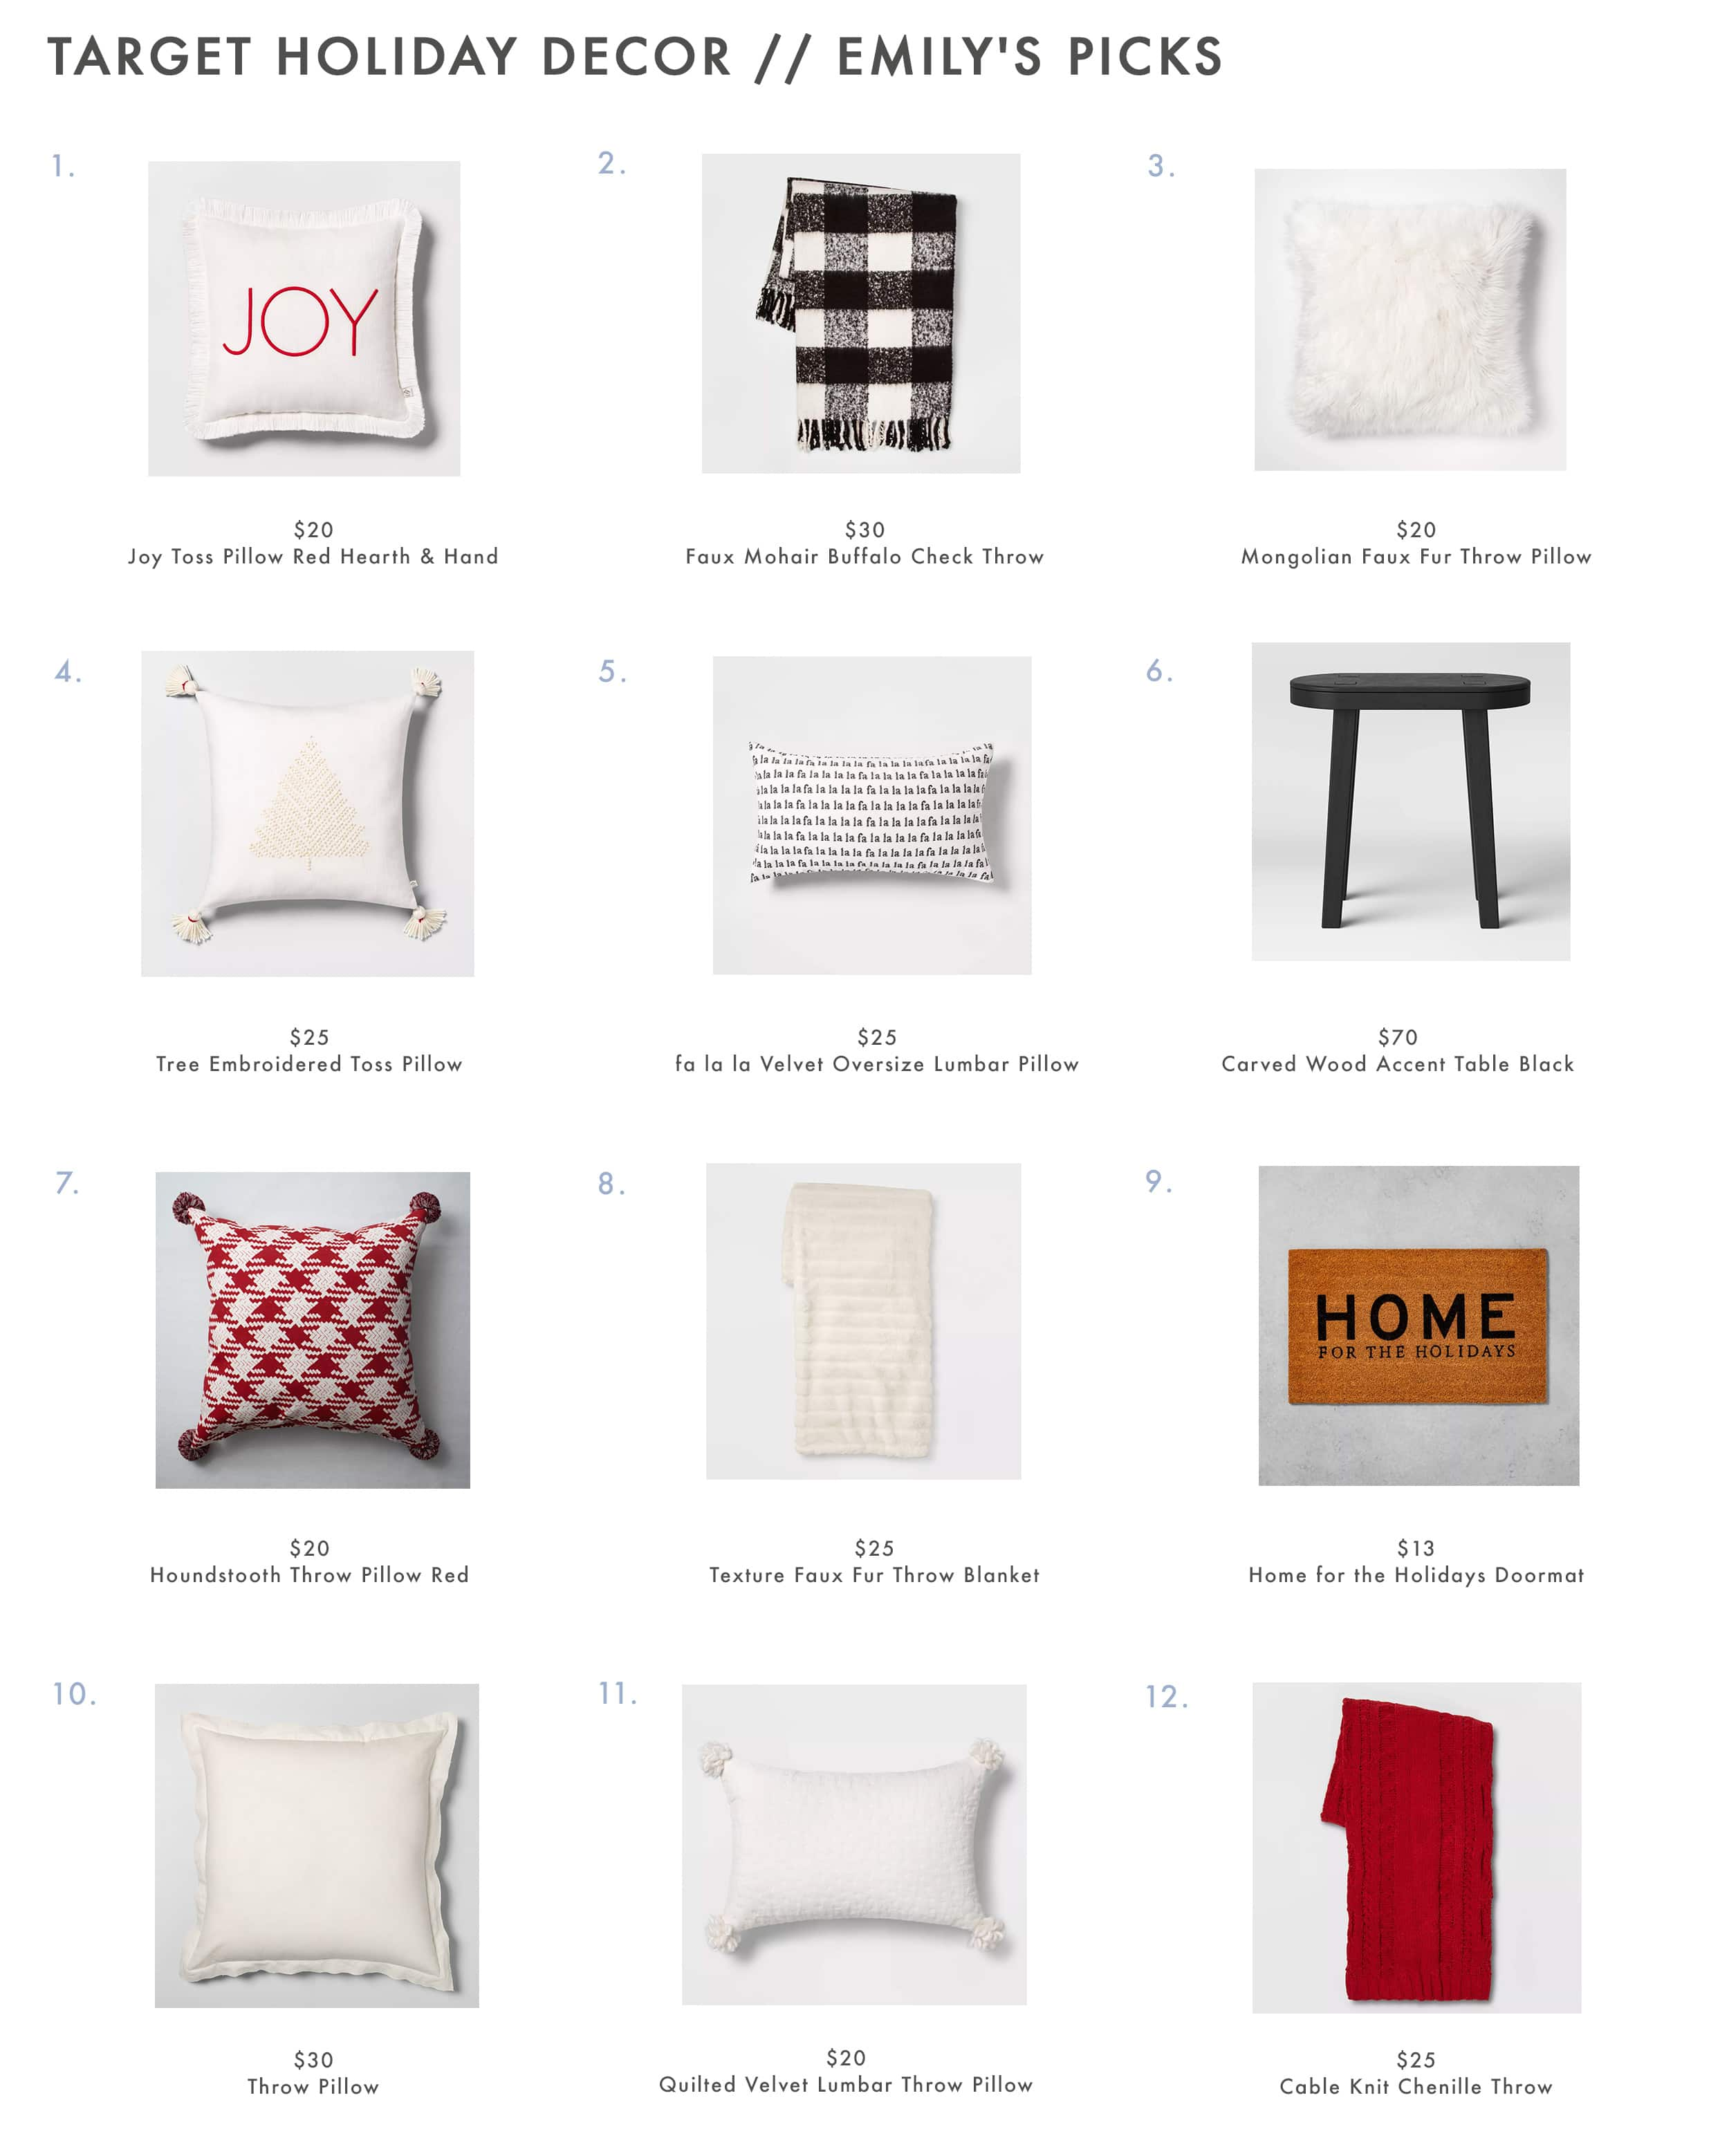 Target Holiday Decor Pillows & Throws